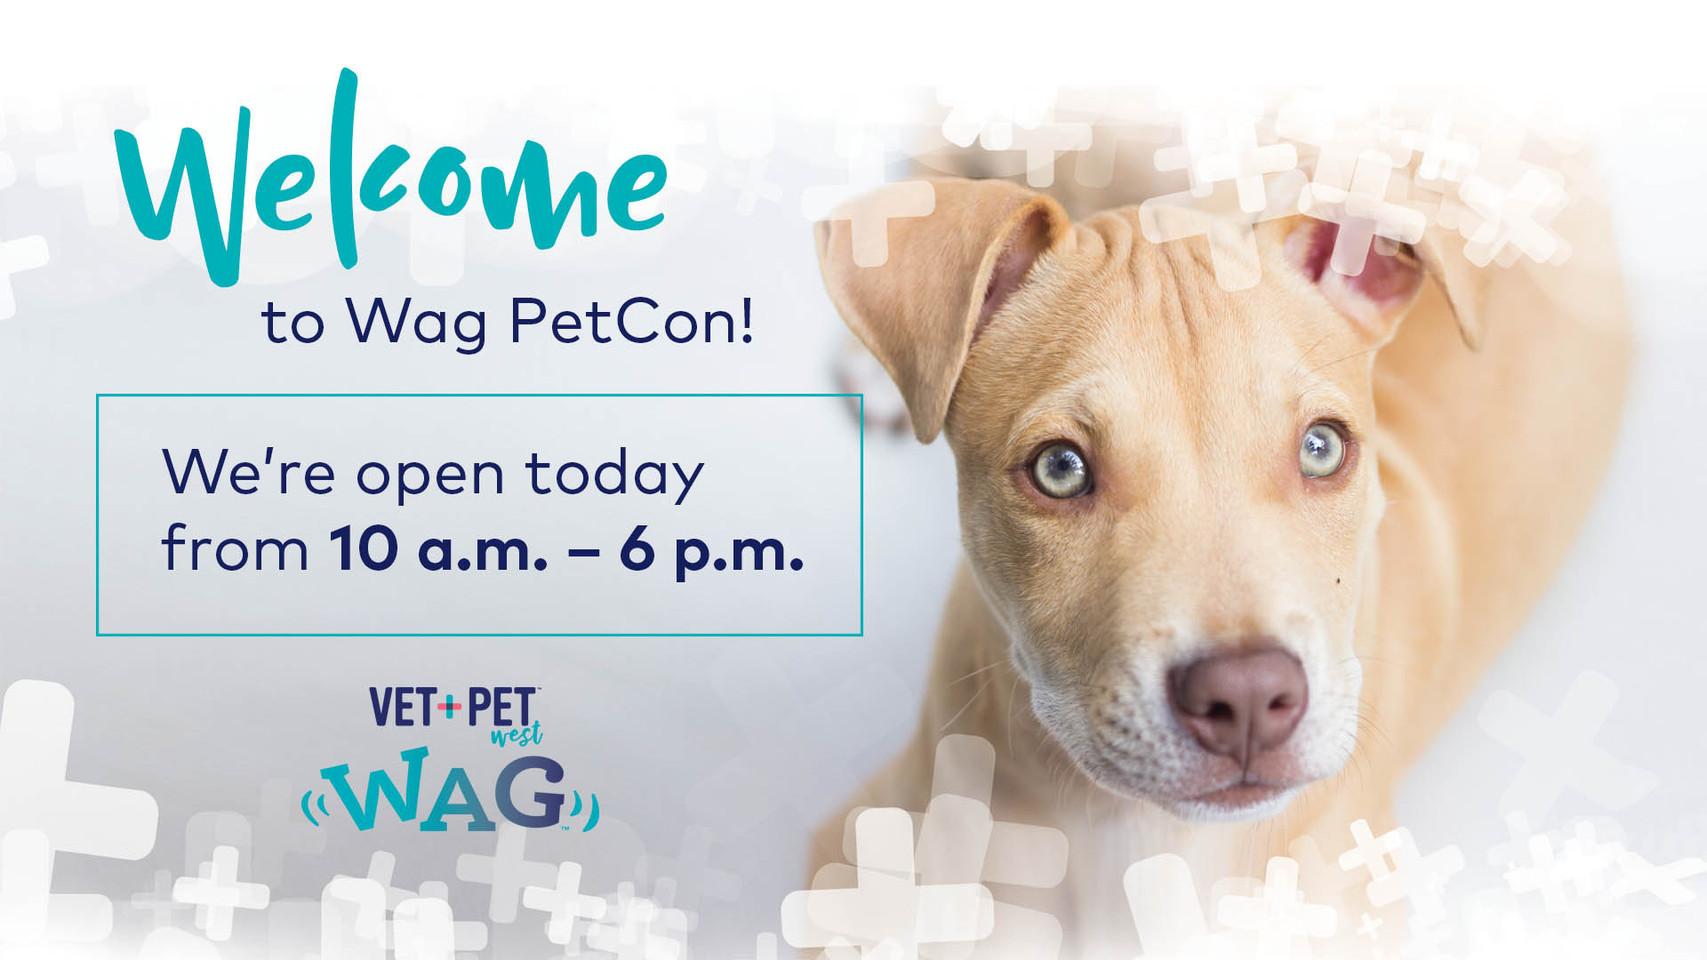 Wag PetCon Digital Signage